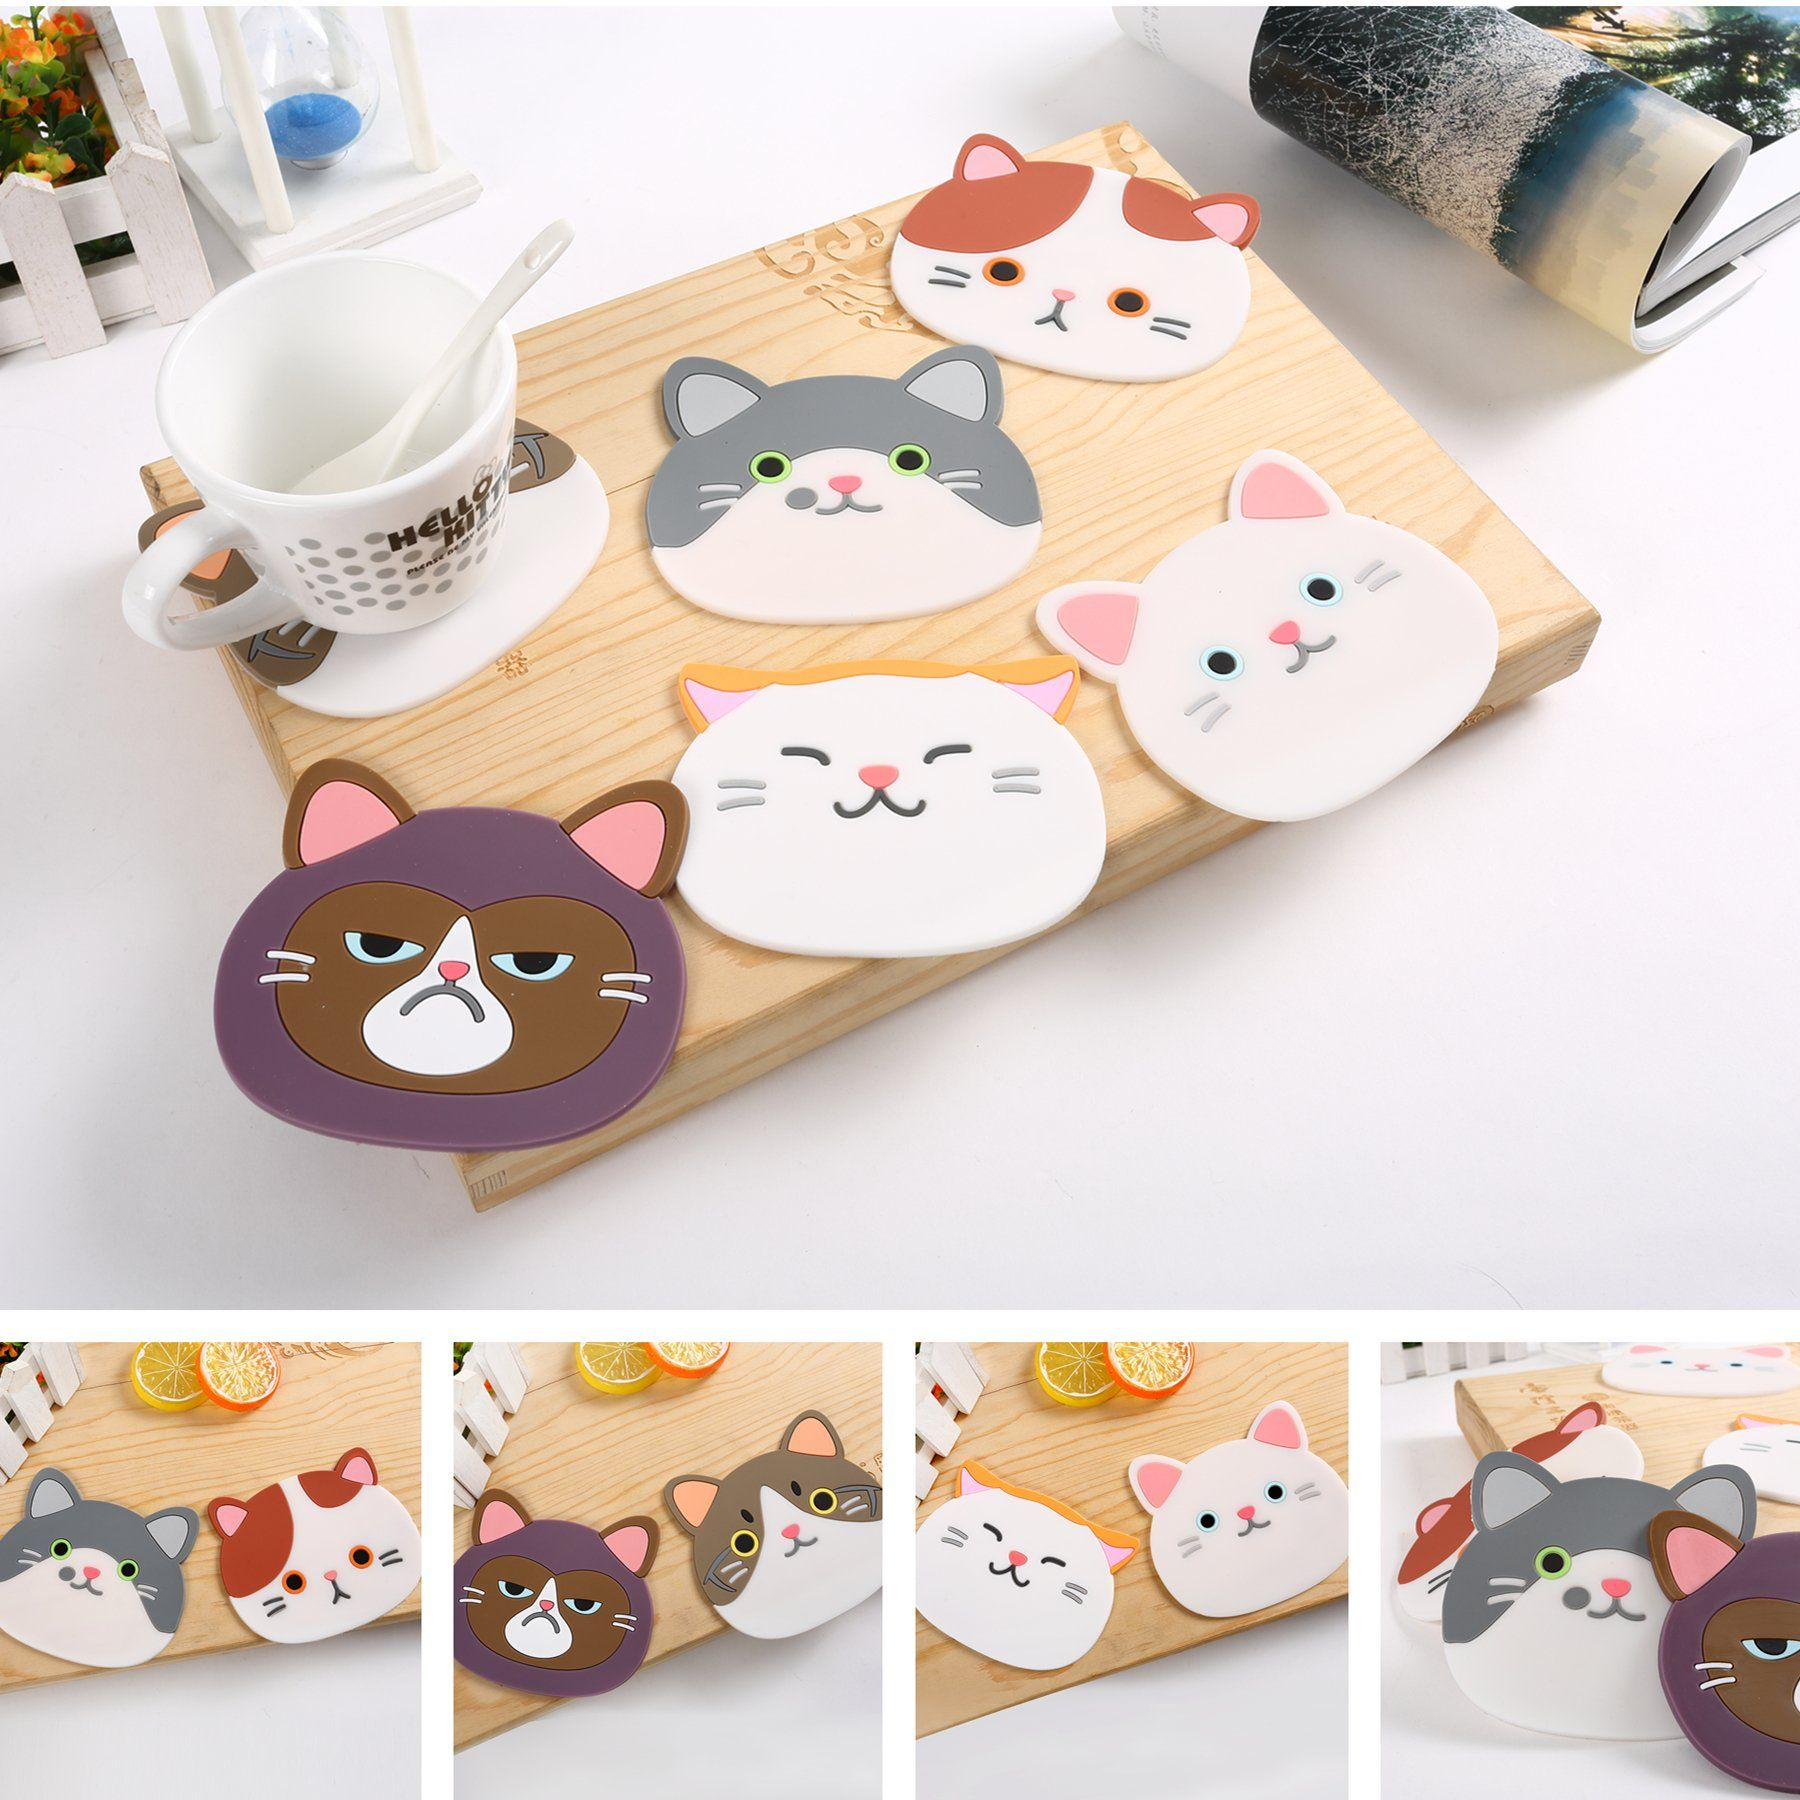 Efivs Arts Qute Cat Cup Mat Silicone Rubber Coaster for